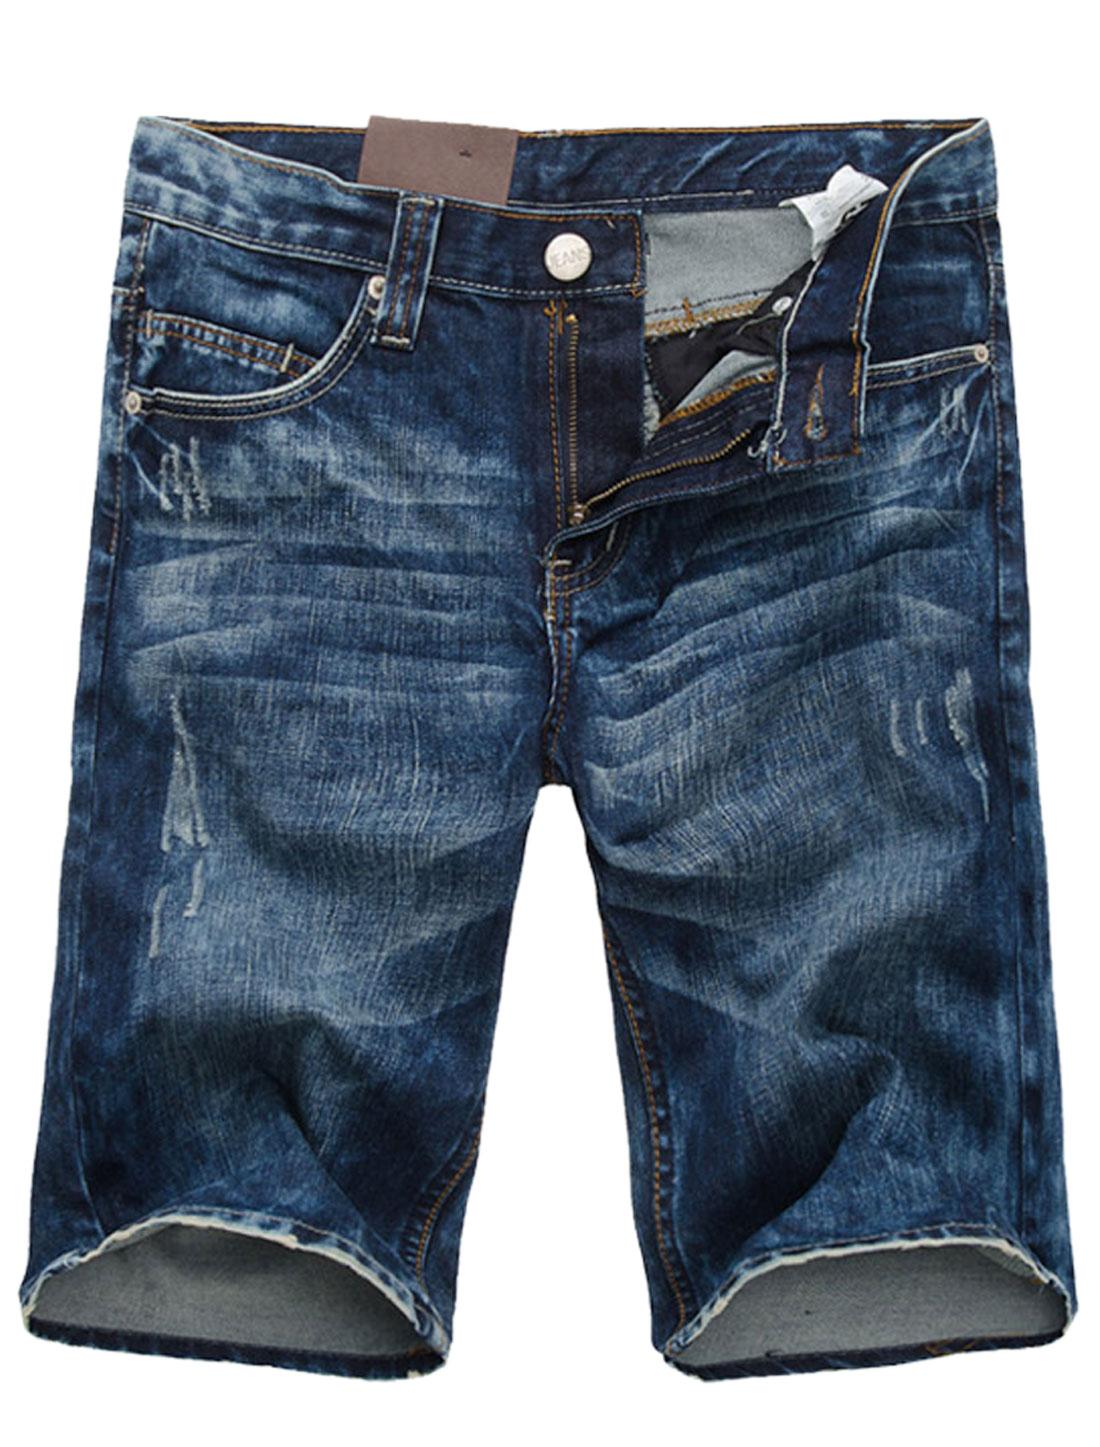 Belt Loop Zip Fly Front Pockets Denim Shorts for Men Dark Blue W30